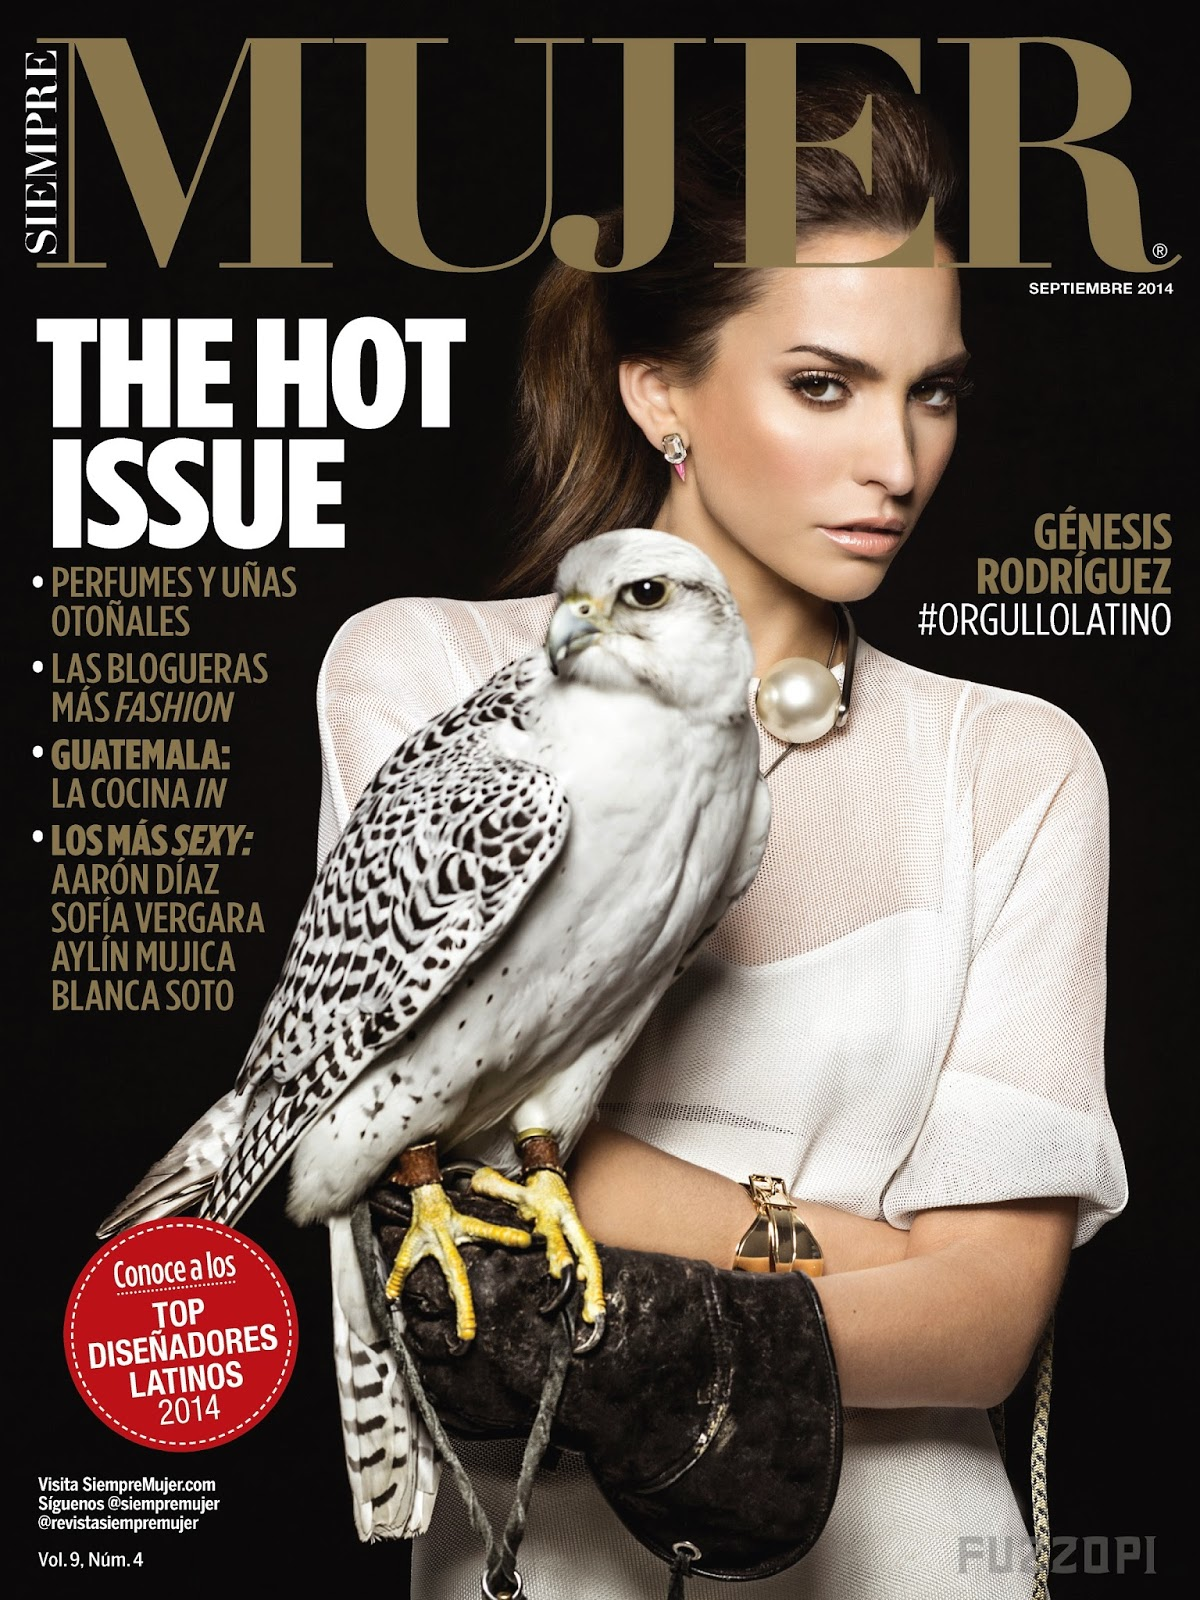 Genesis Rodriguez - Siempre Mujer Magazine, September 2014